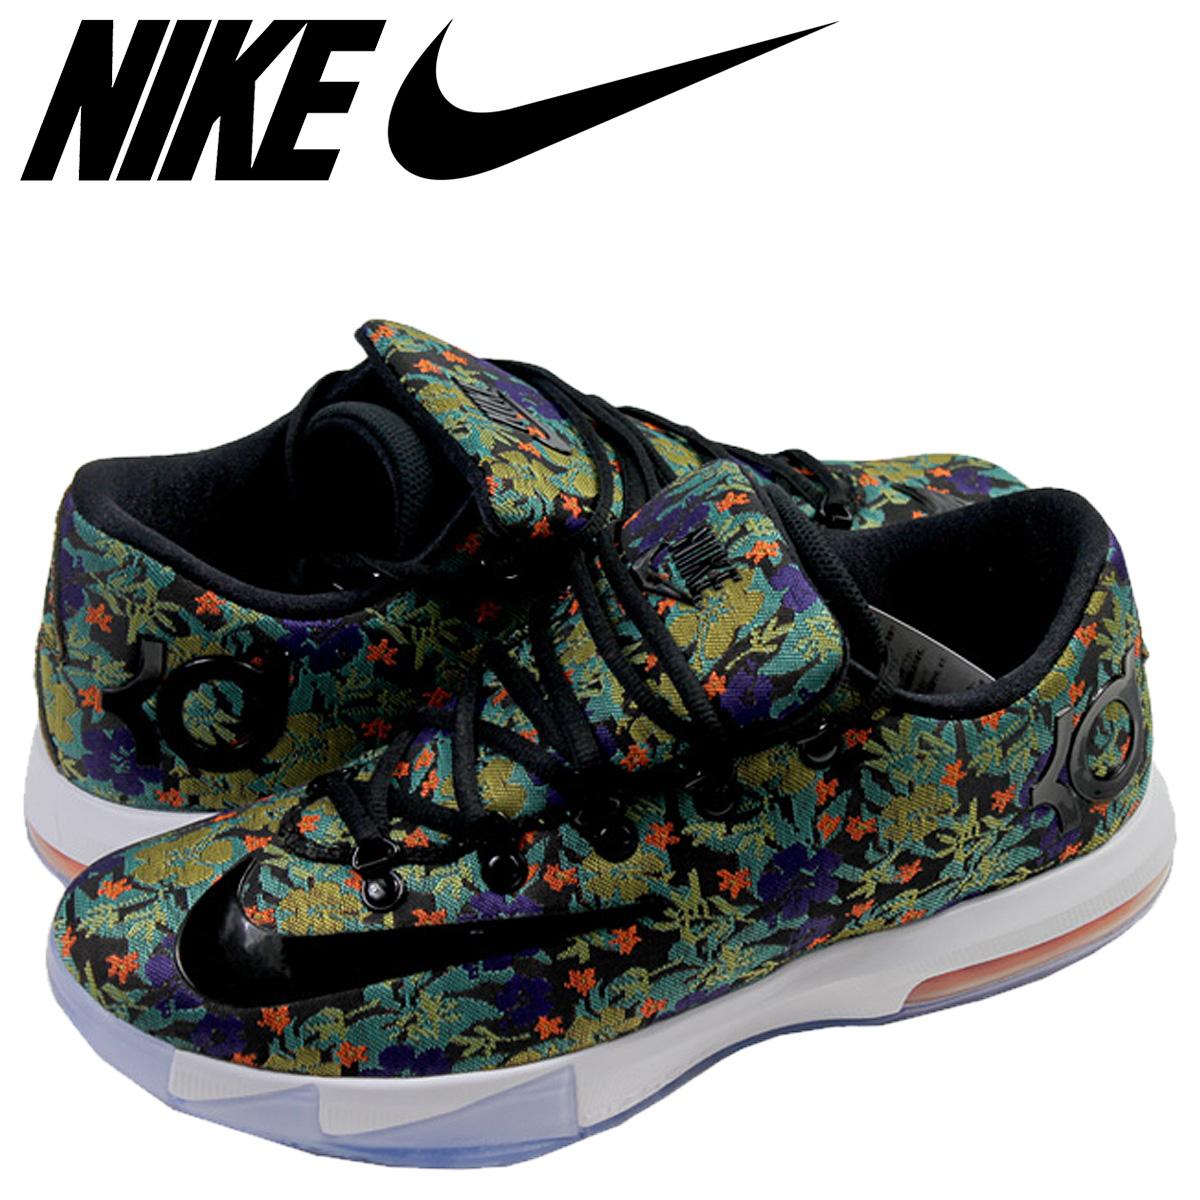 size 40 de924 e58bc Nike NIKE Kay D sneakers KD VI EXT QS FLORAL Kevin Durant 6 floral  652,120-900 multi-men